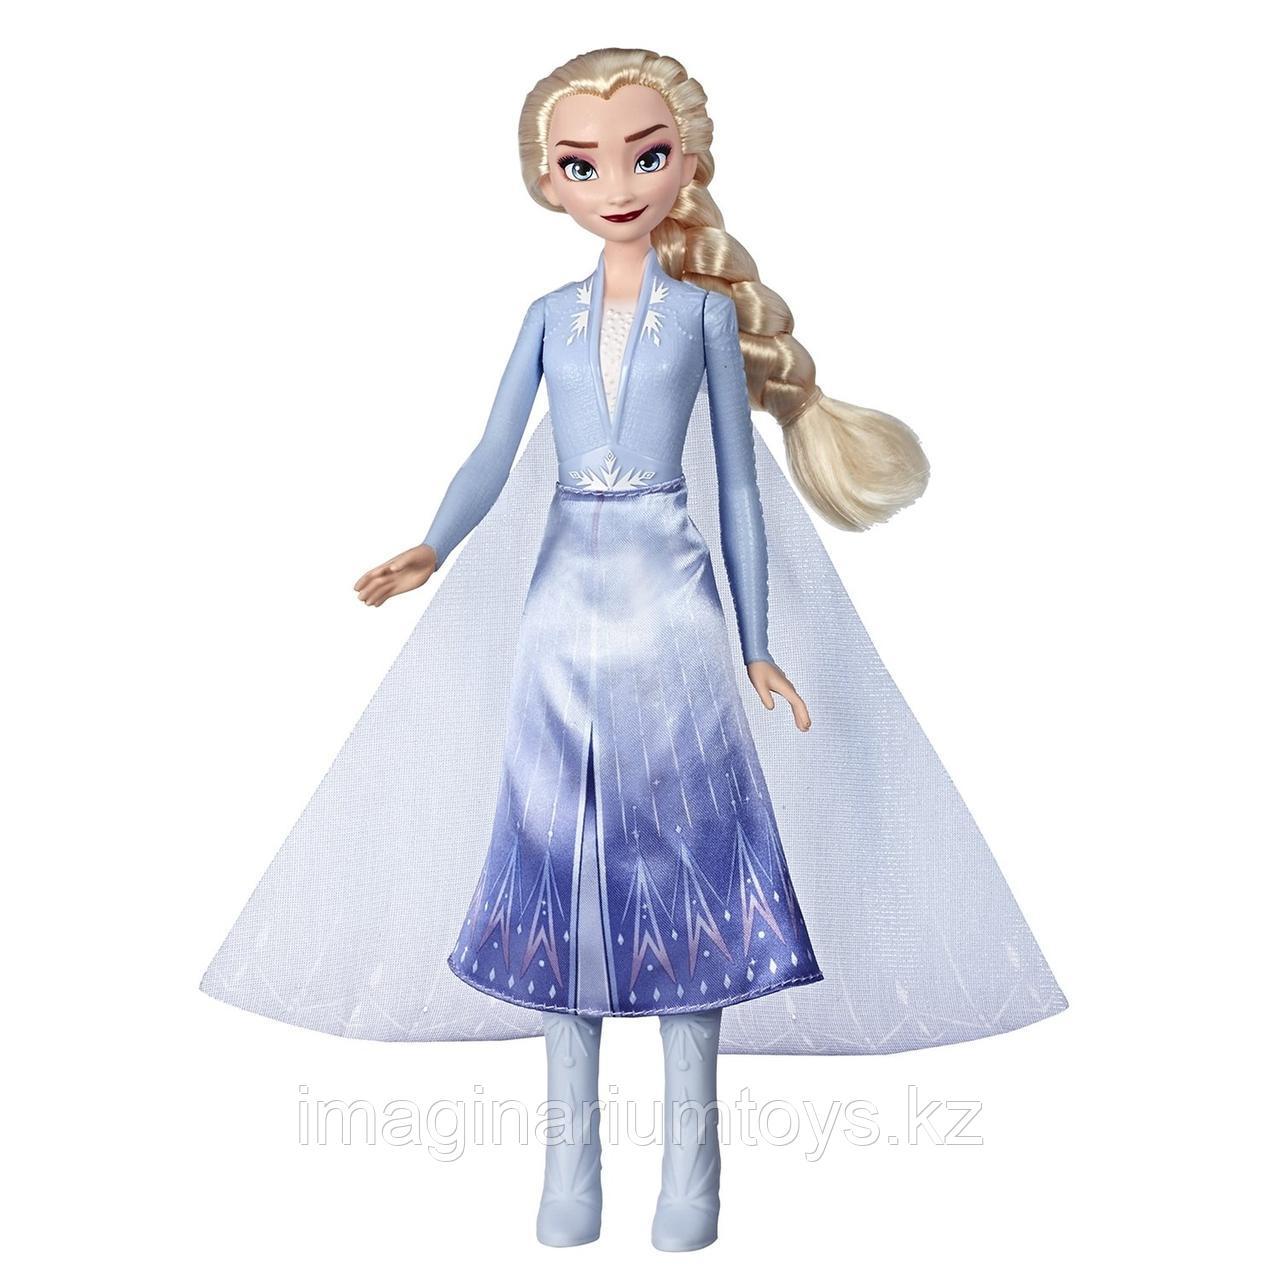 Кукла Эльза со сверкающим платьем Frozen 2 Hasbro